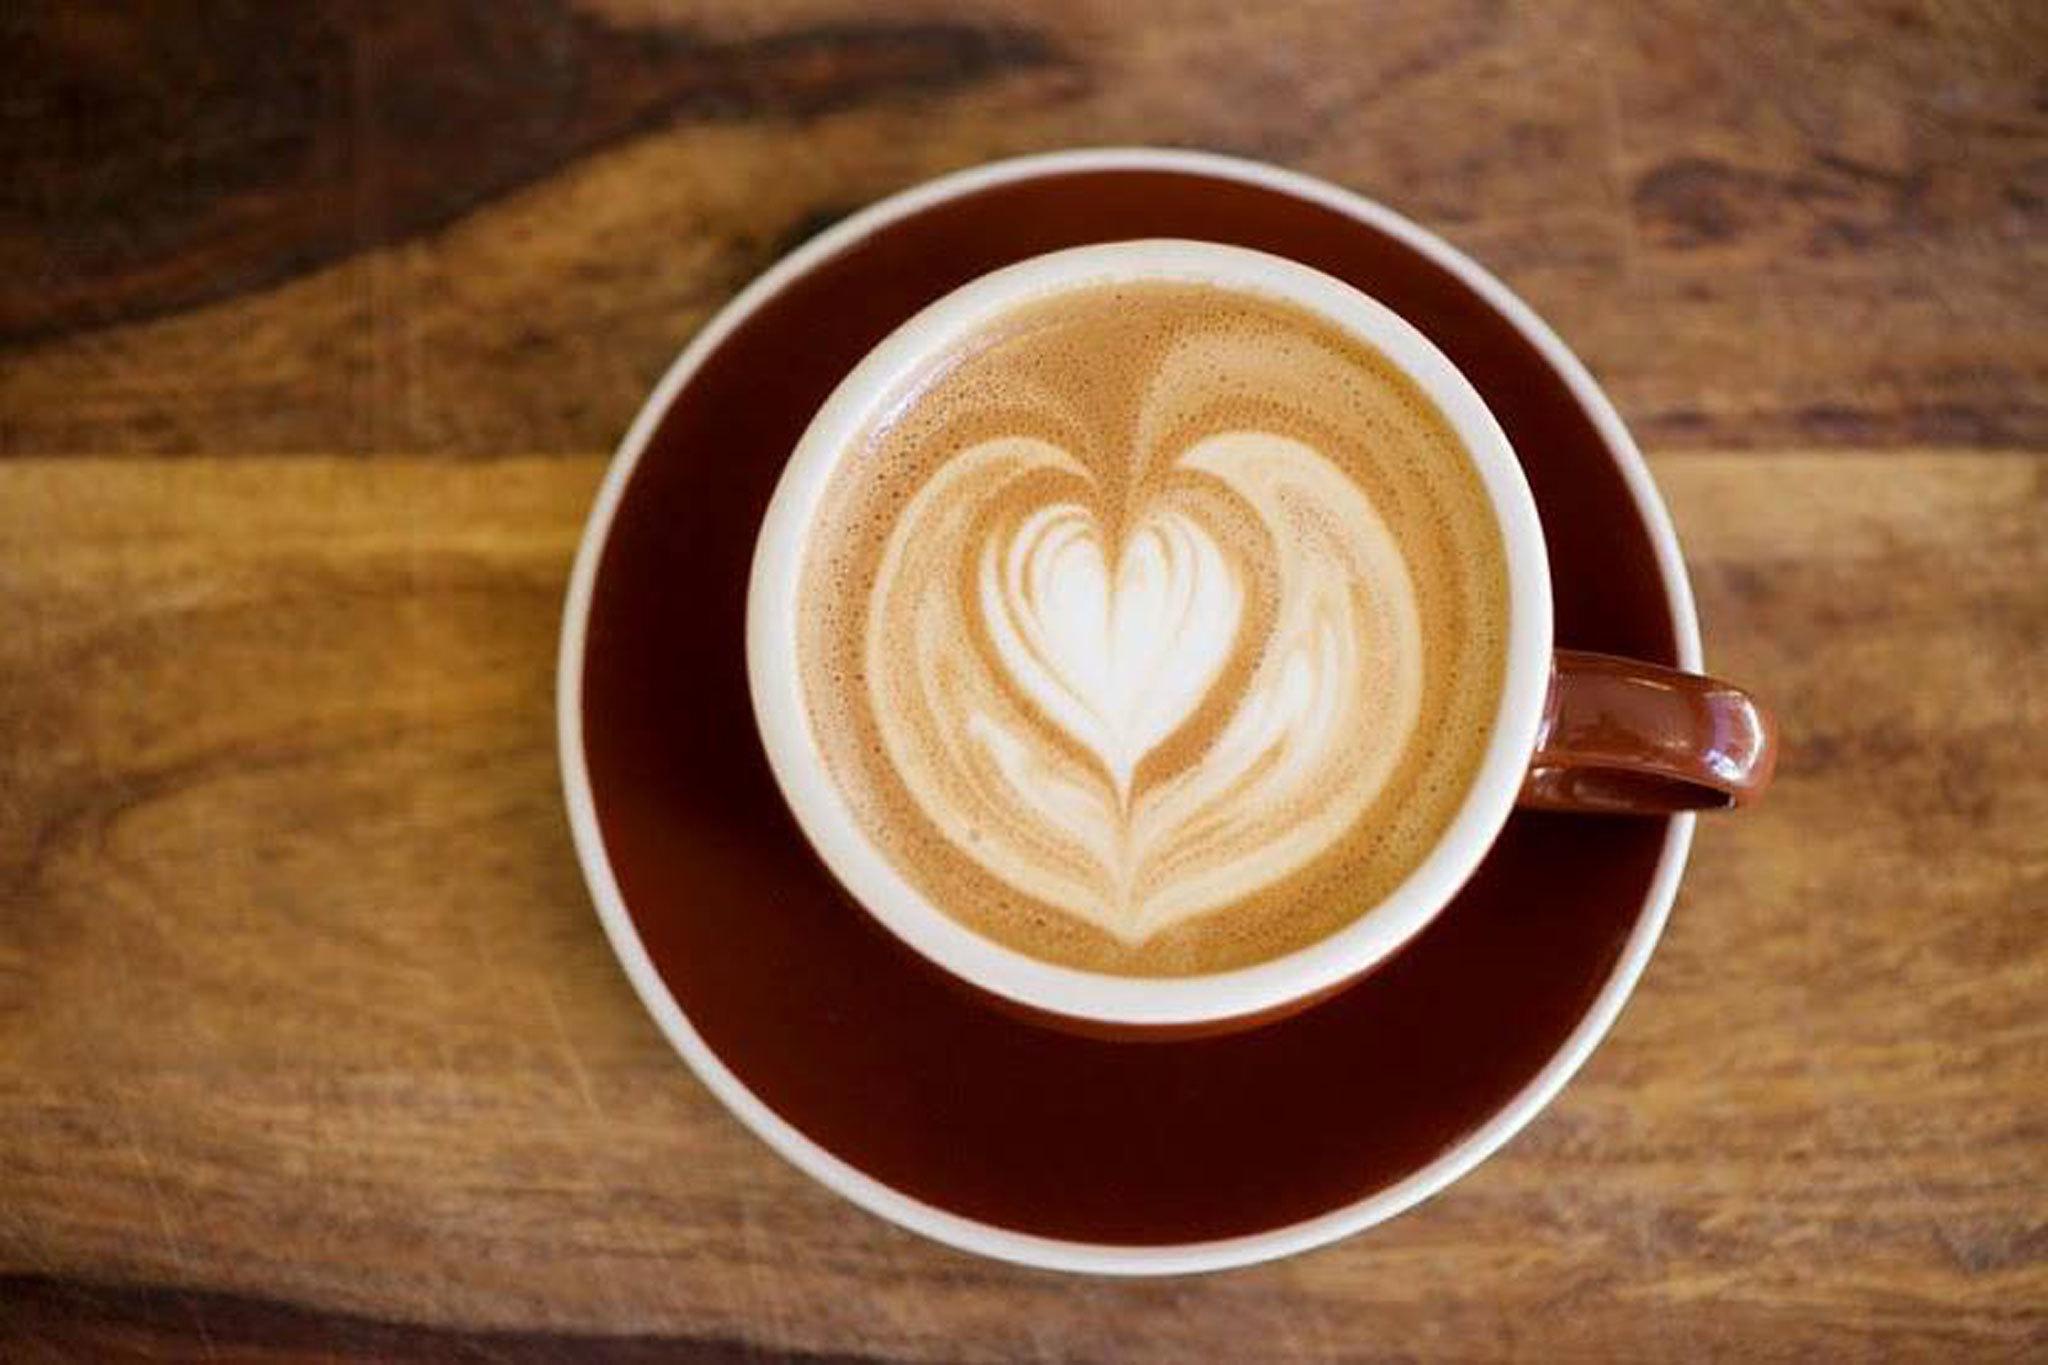 Groundwork Coffee Co.